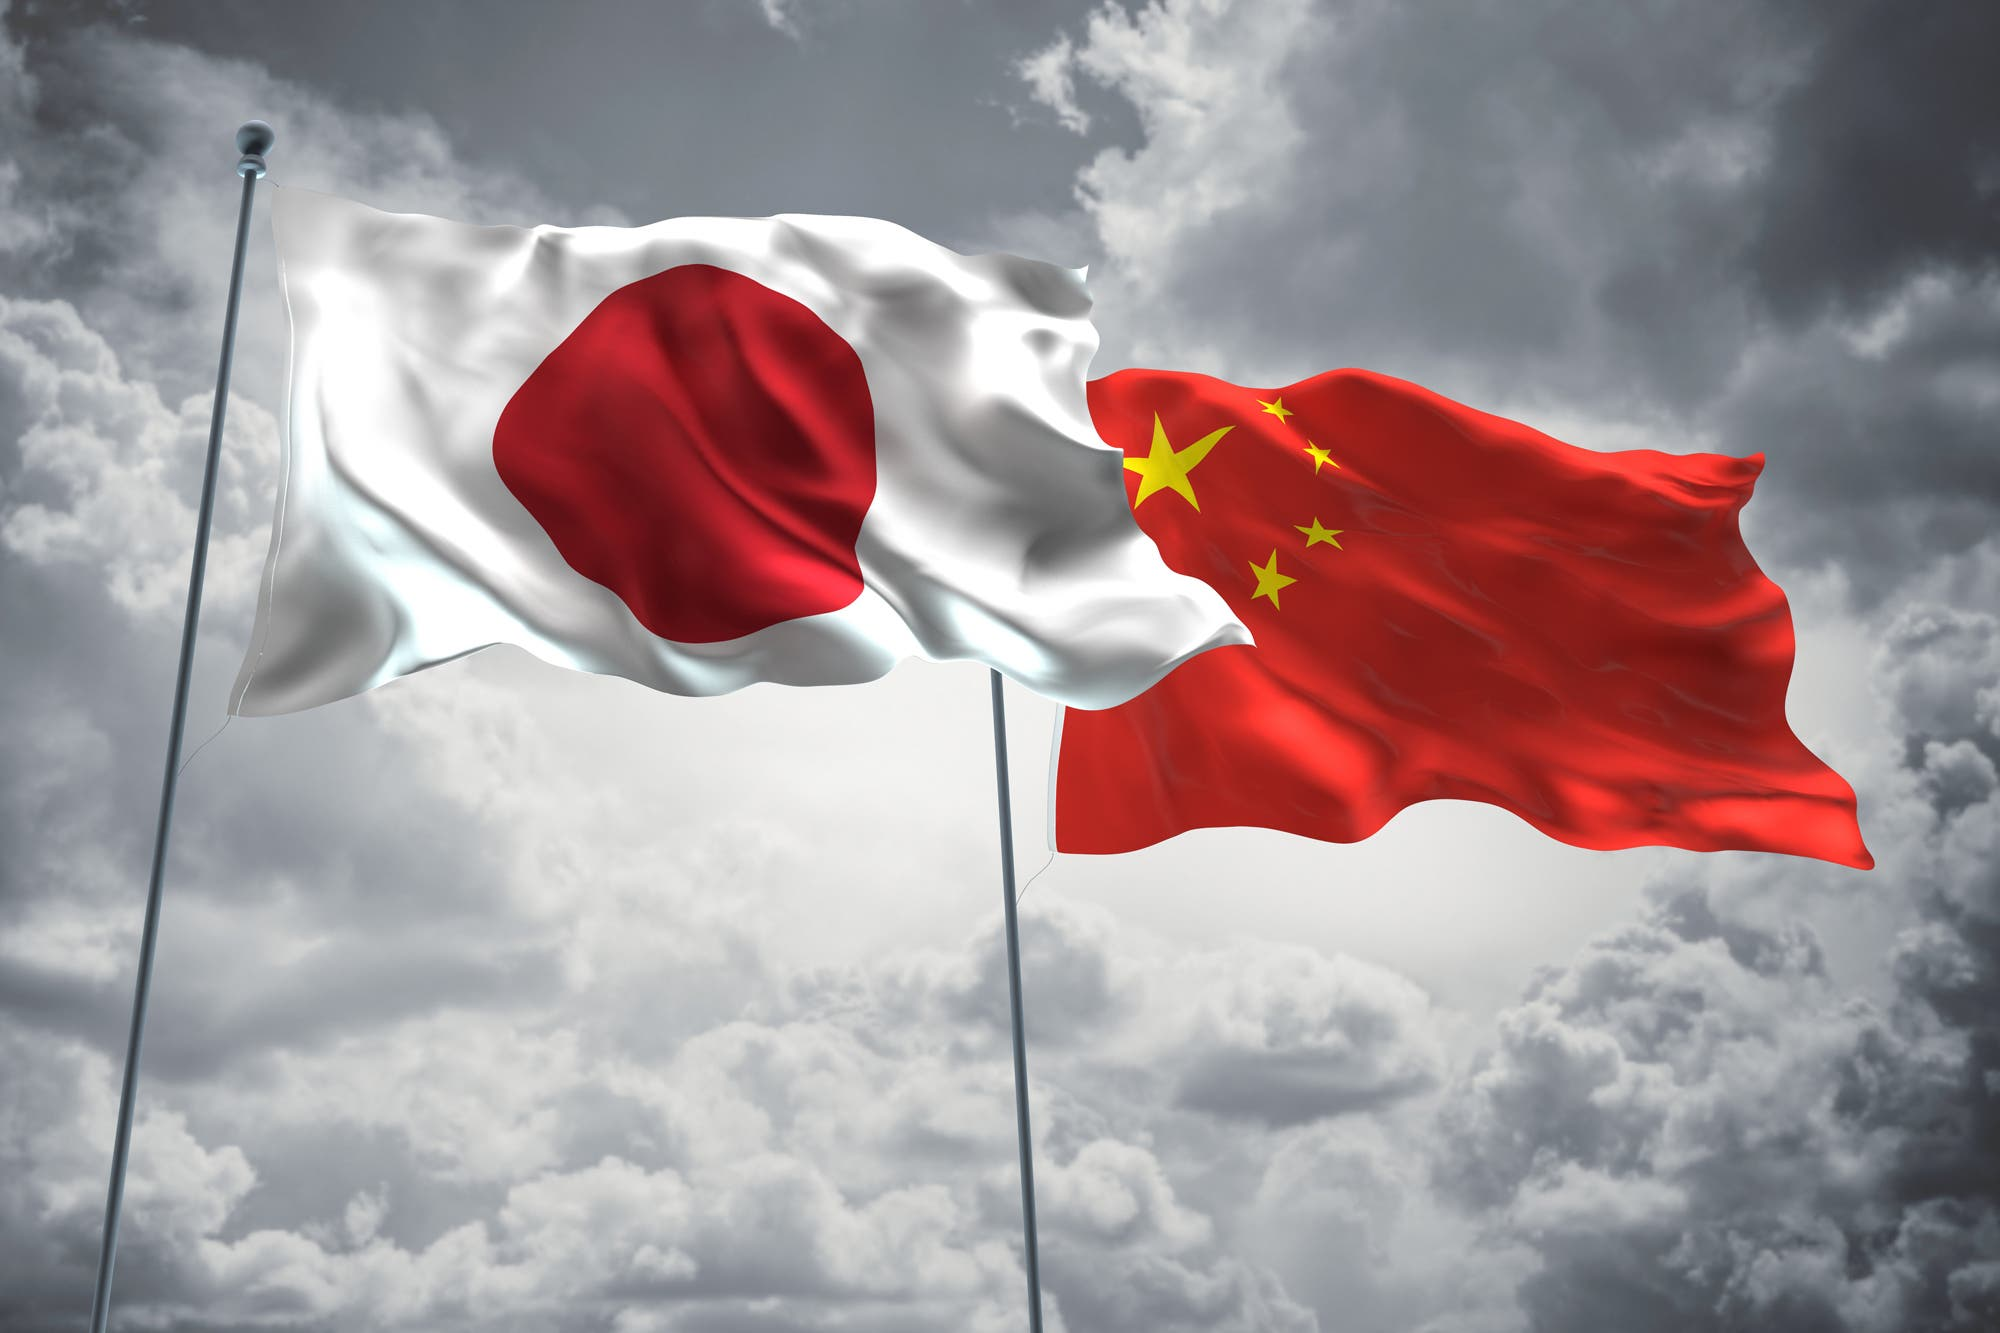 Relaciones. A Japón le va bien en China, a pesar de la rivalidad